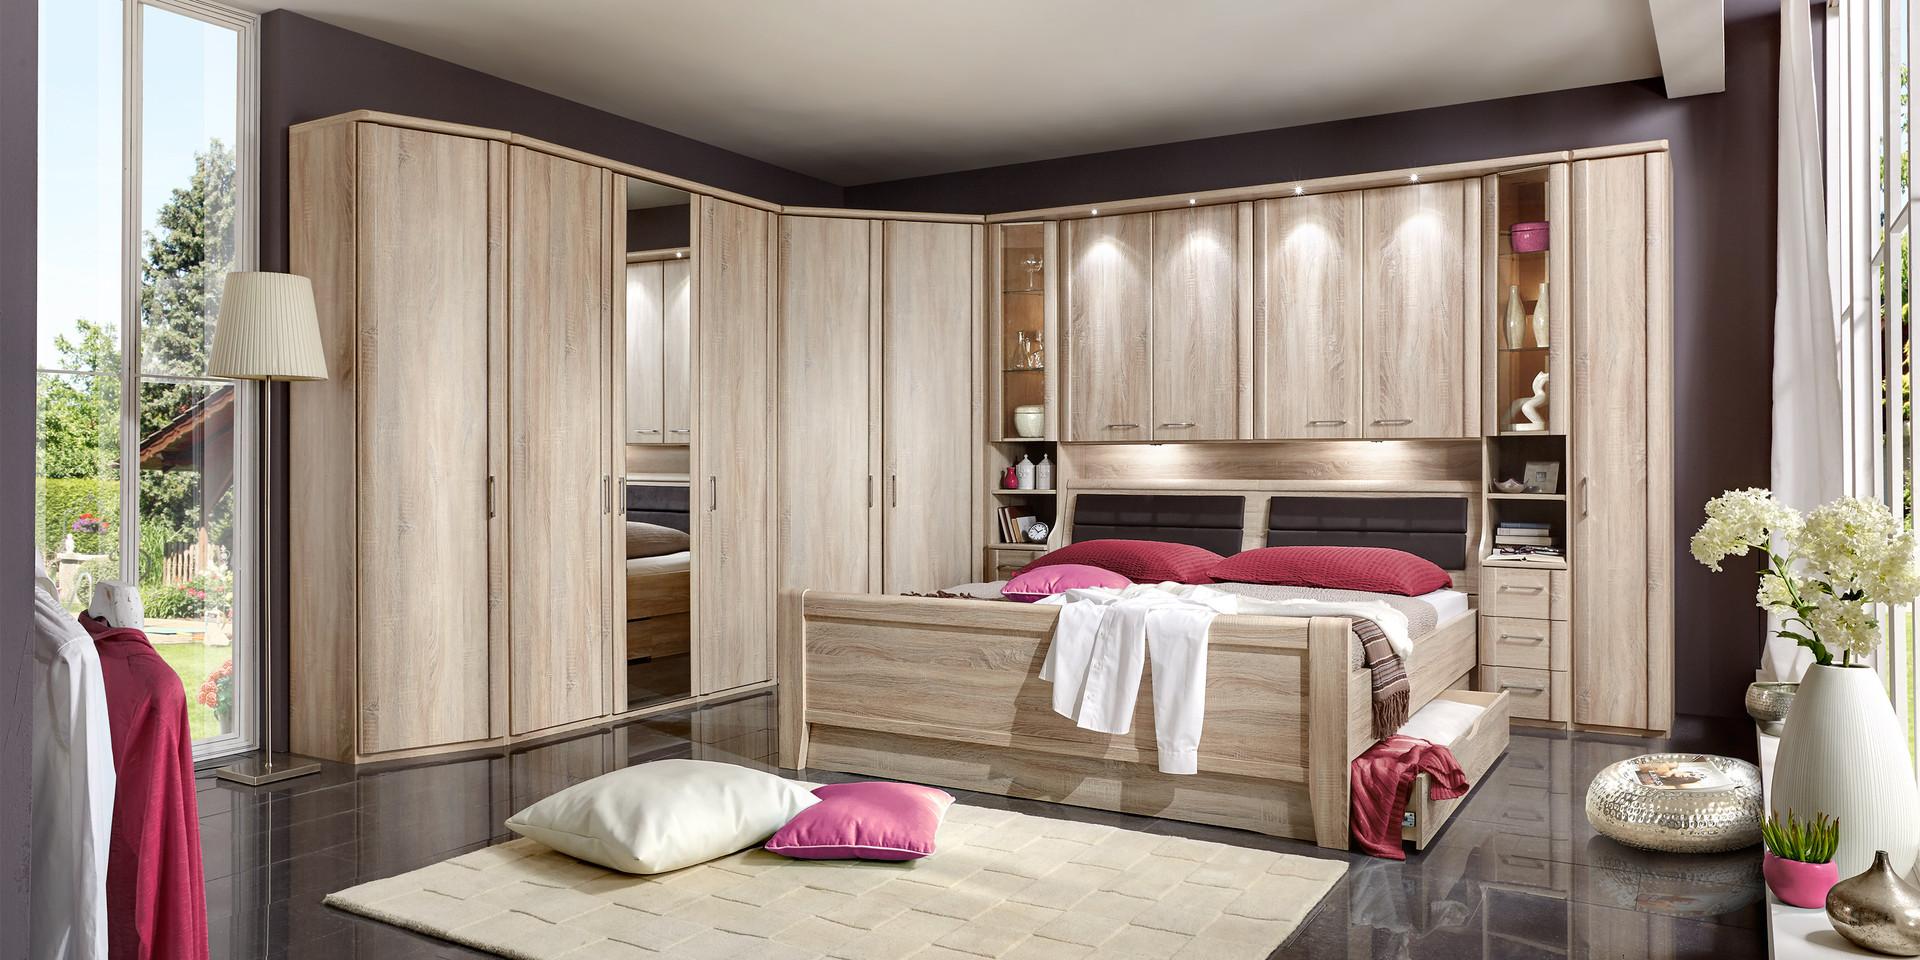 slaapkamer w05lu meubelen joremeubelen jore. Black Bedroom Furniture Sets. Home Design Ideas